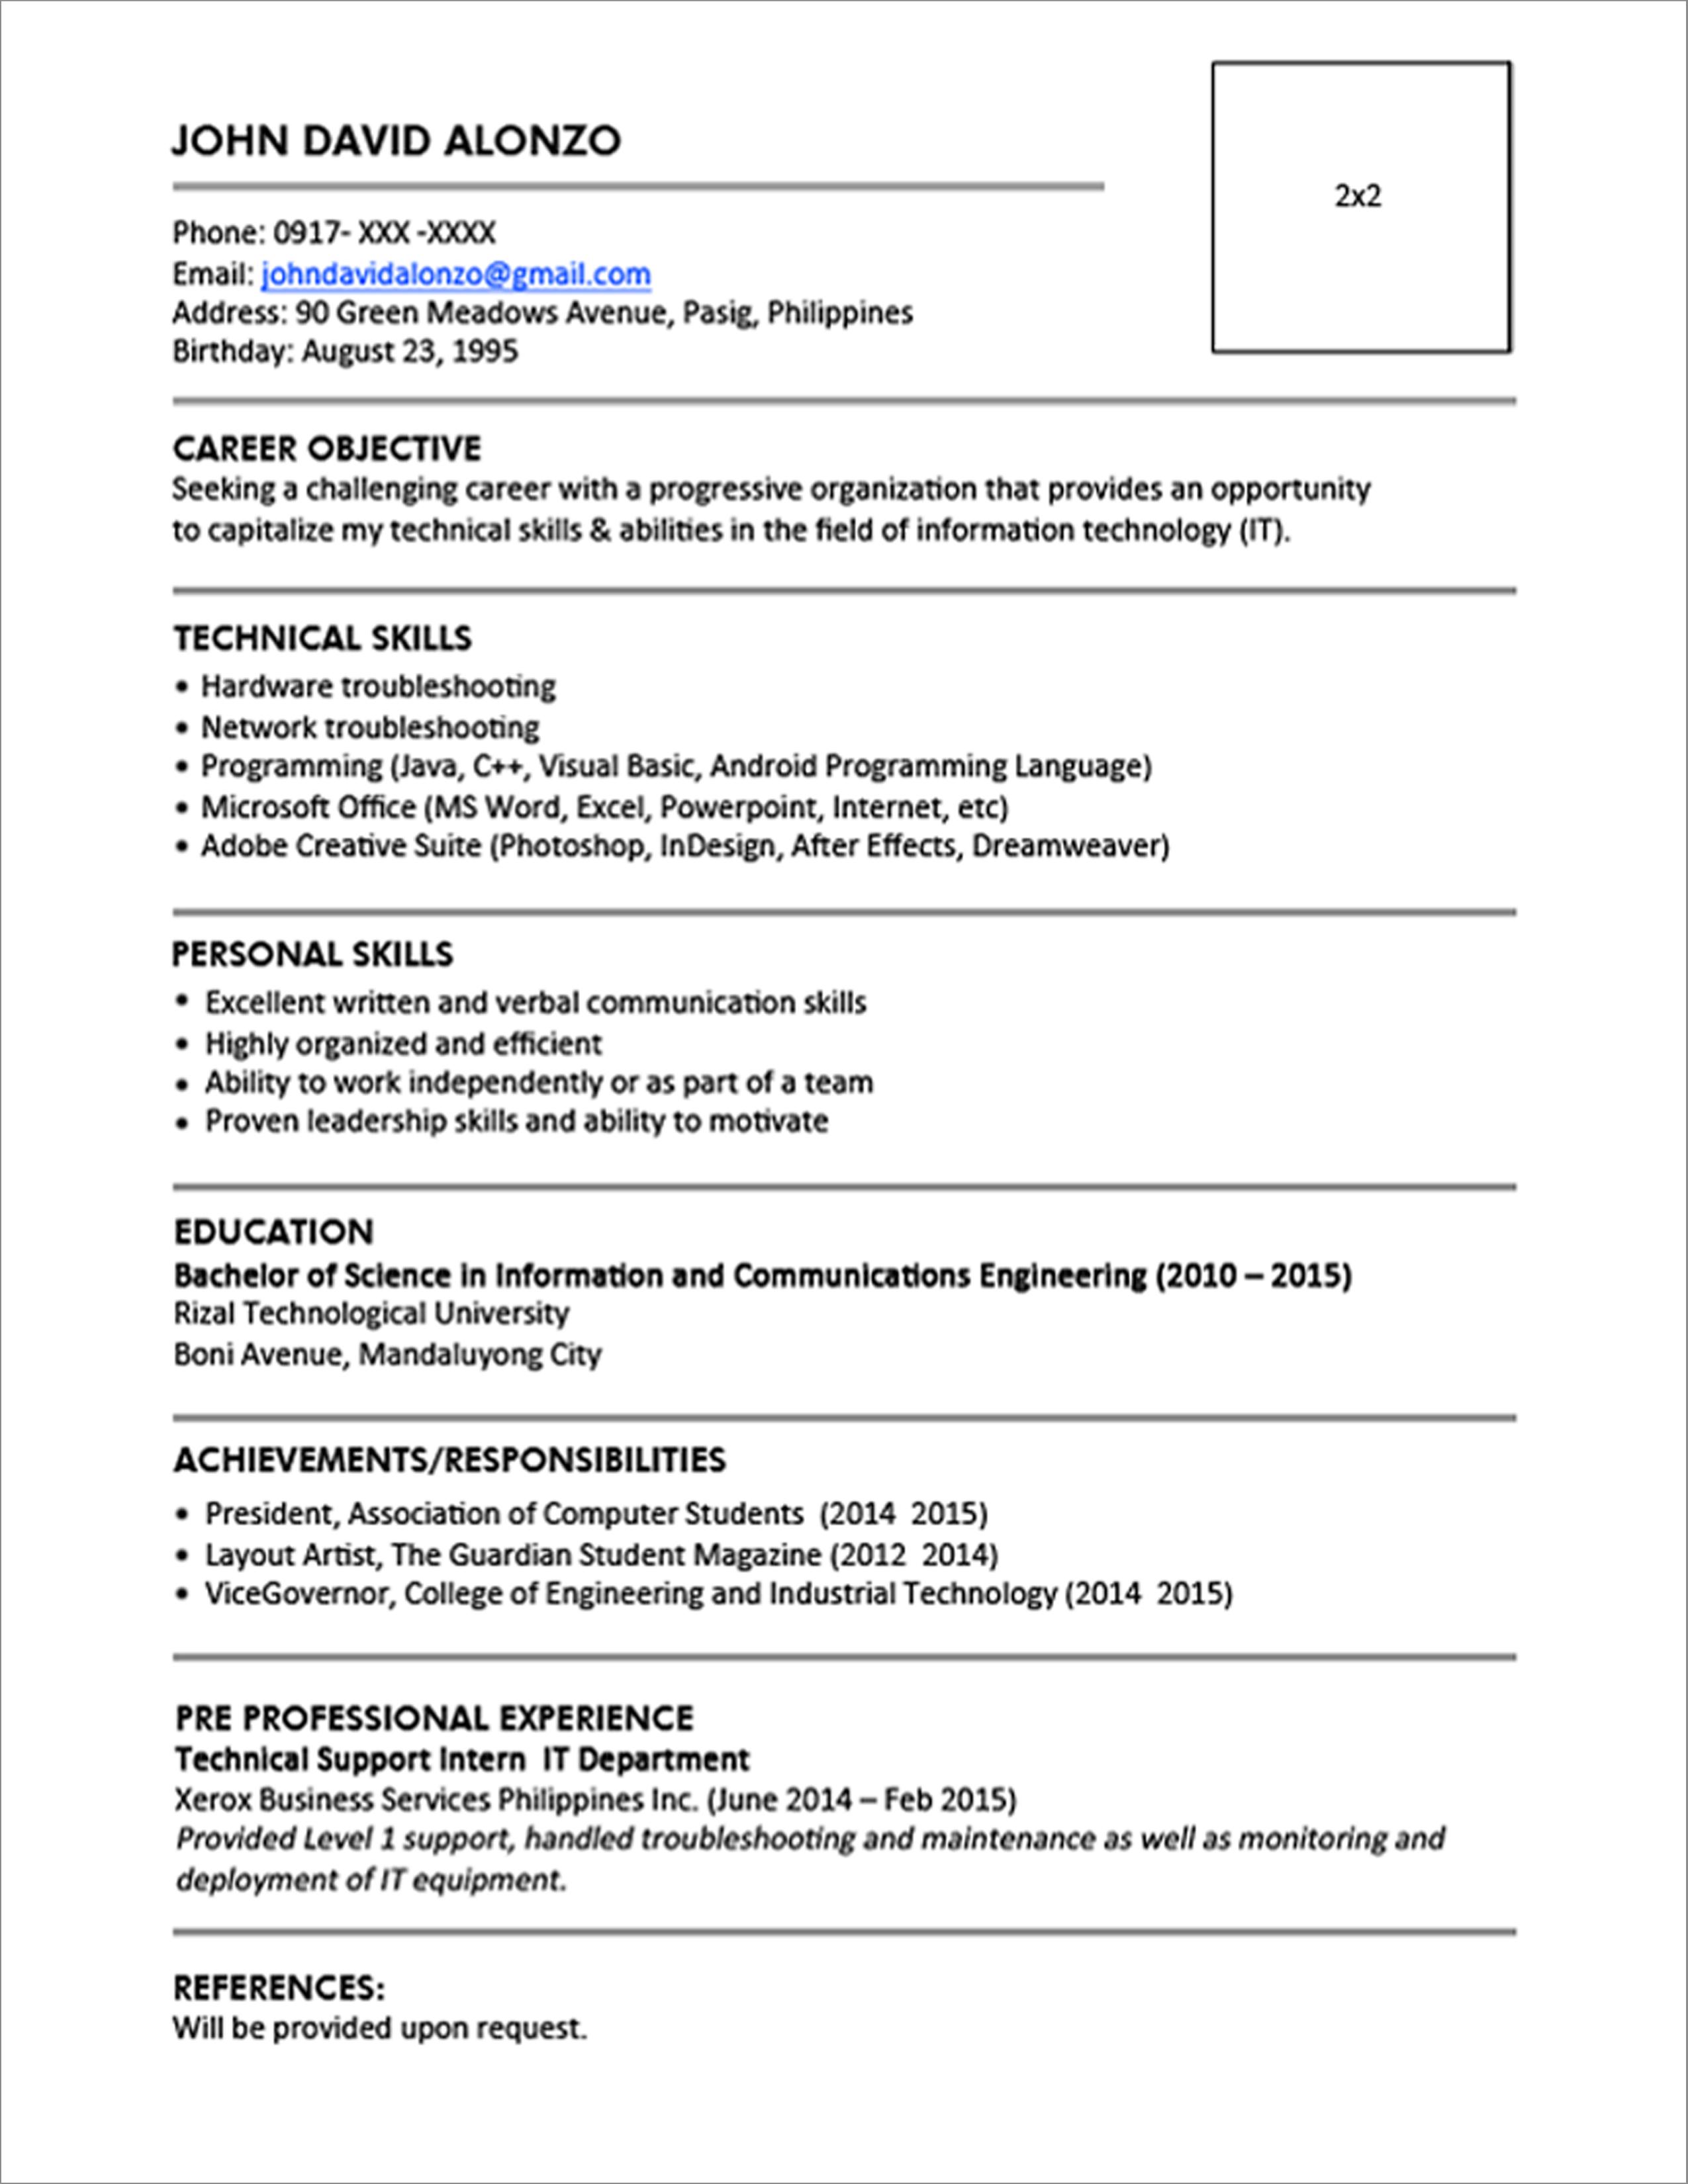 Resume Example For Fresh Graduate Engineering